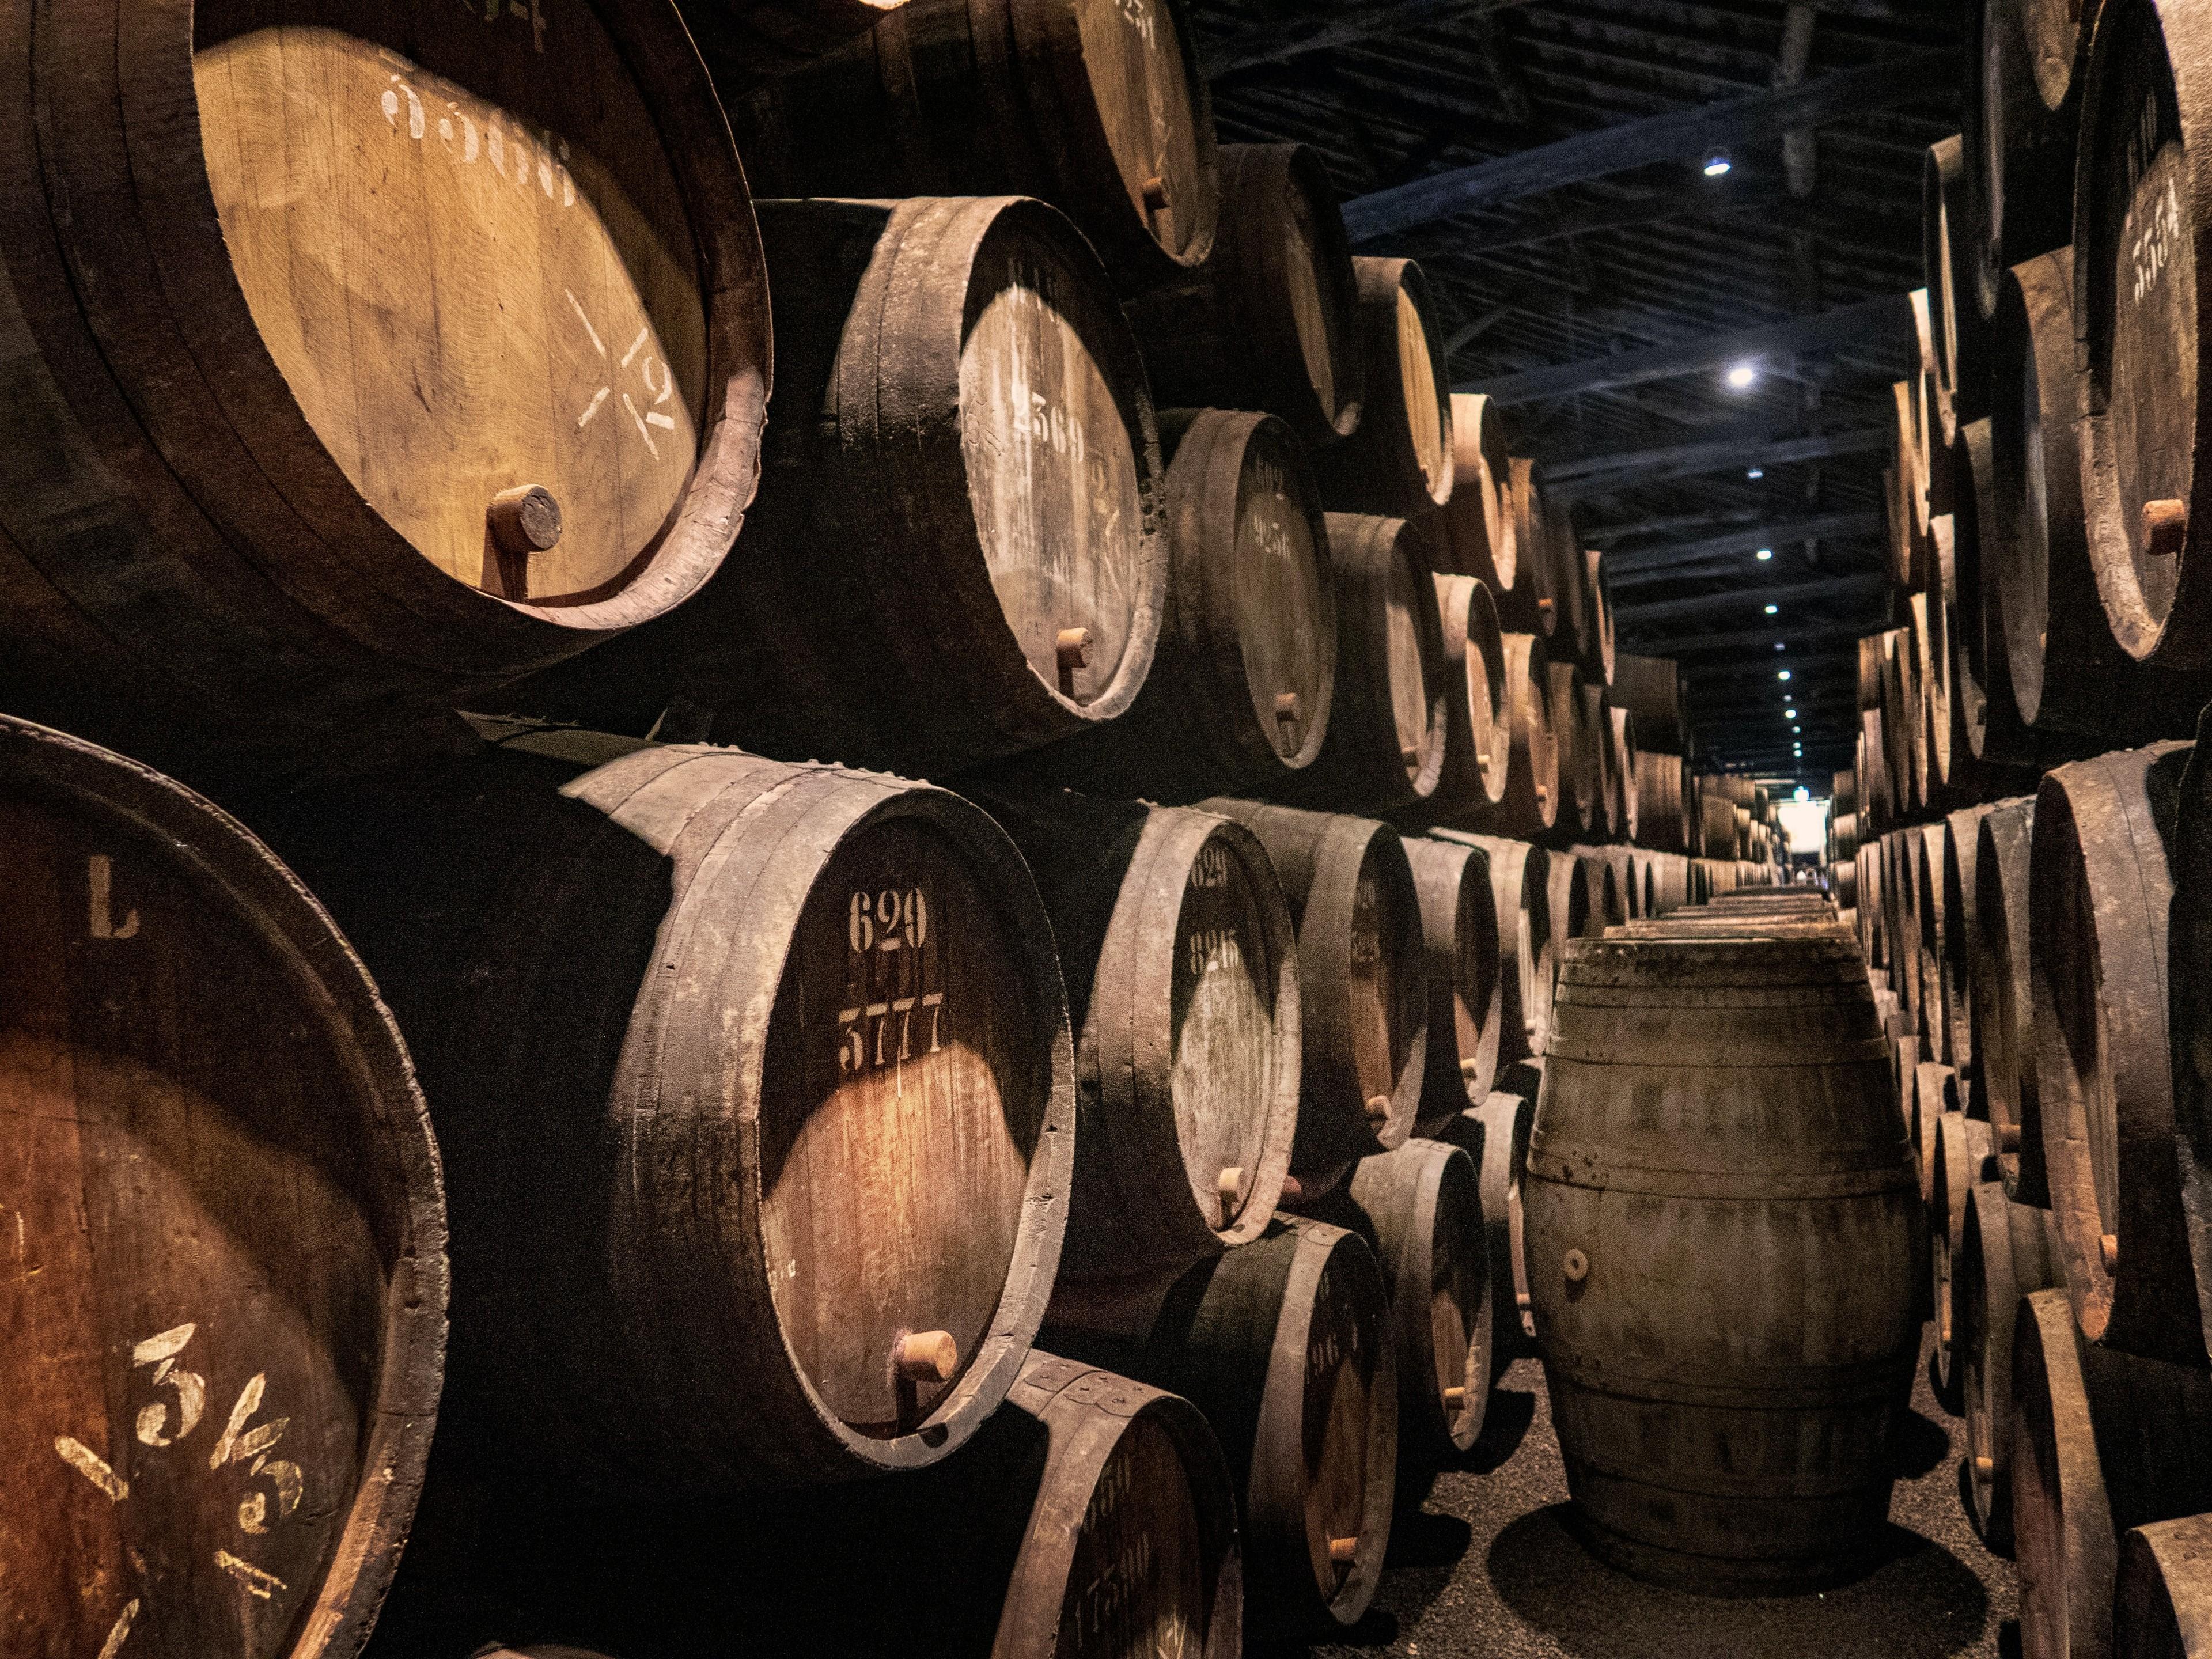 Wine Barrel vs whiskey barrel